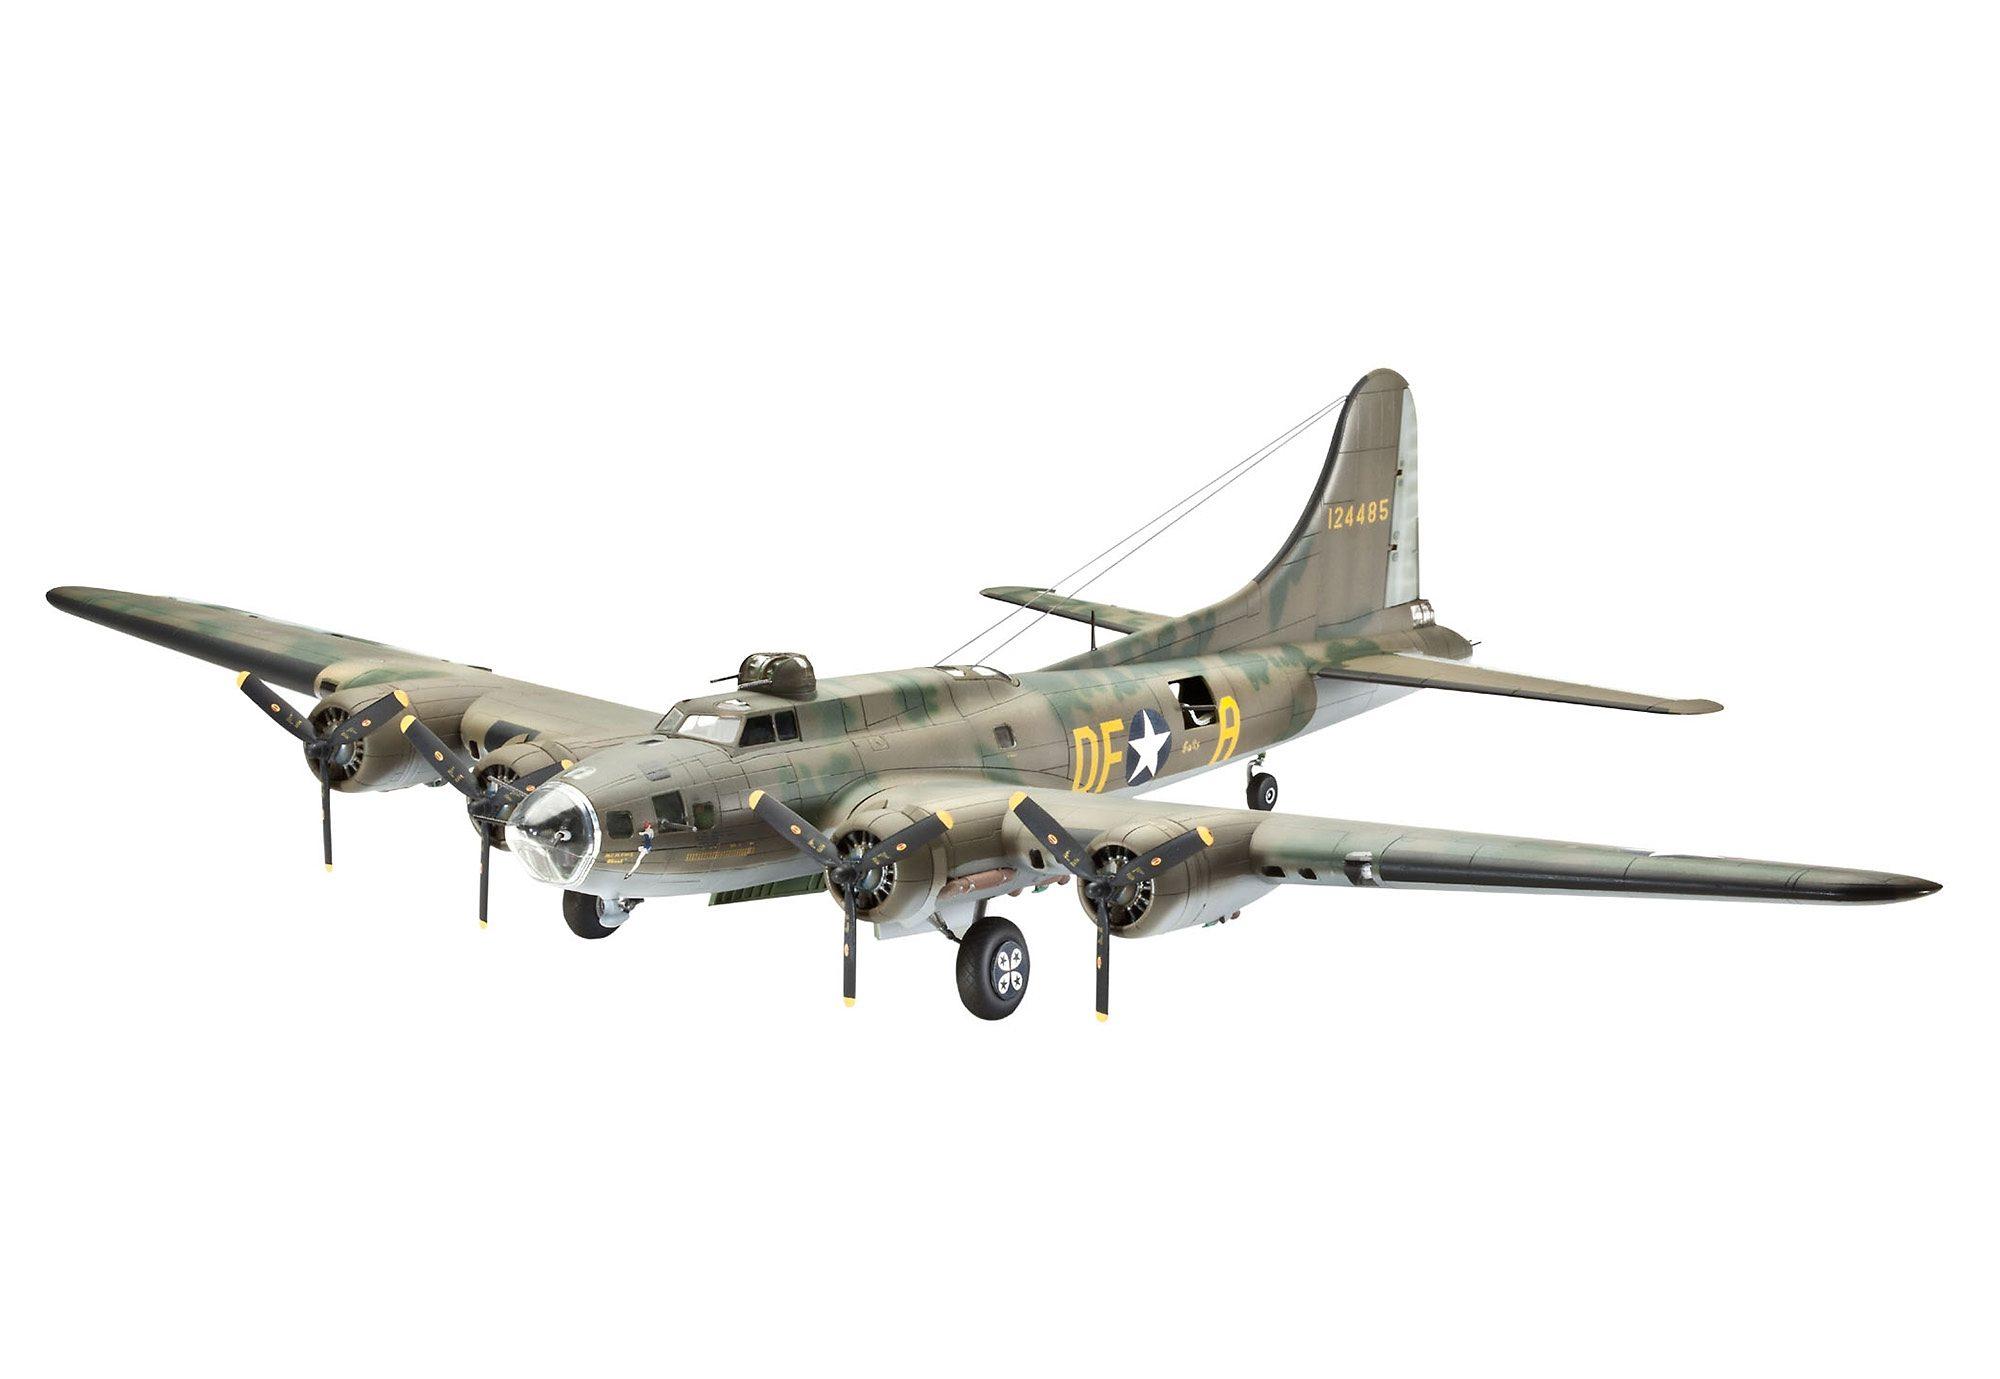 Revell® Modellbausatz Flugzeug, »B-17 Memphis Belle«, Maßstab 1:72